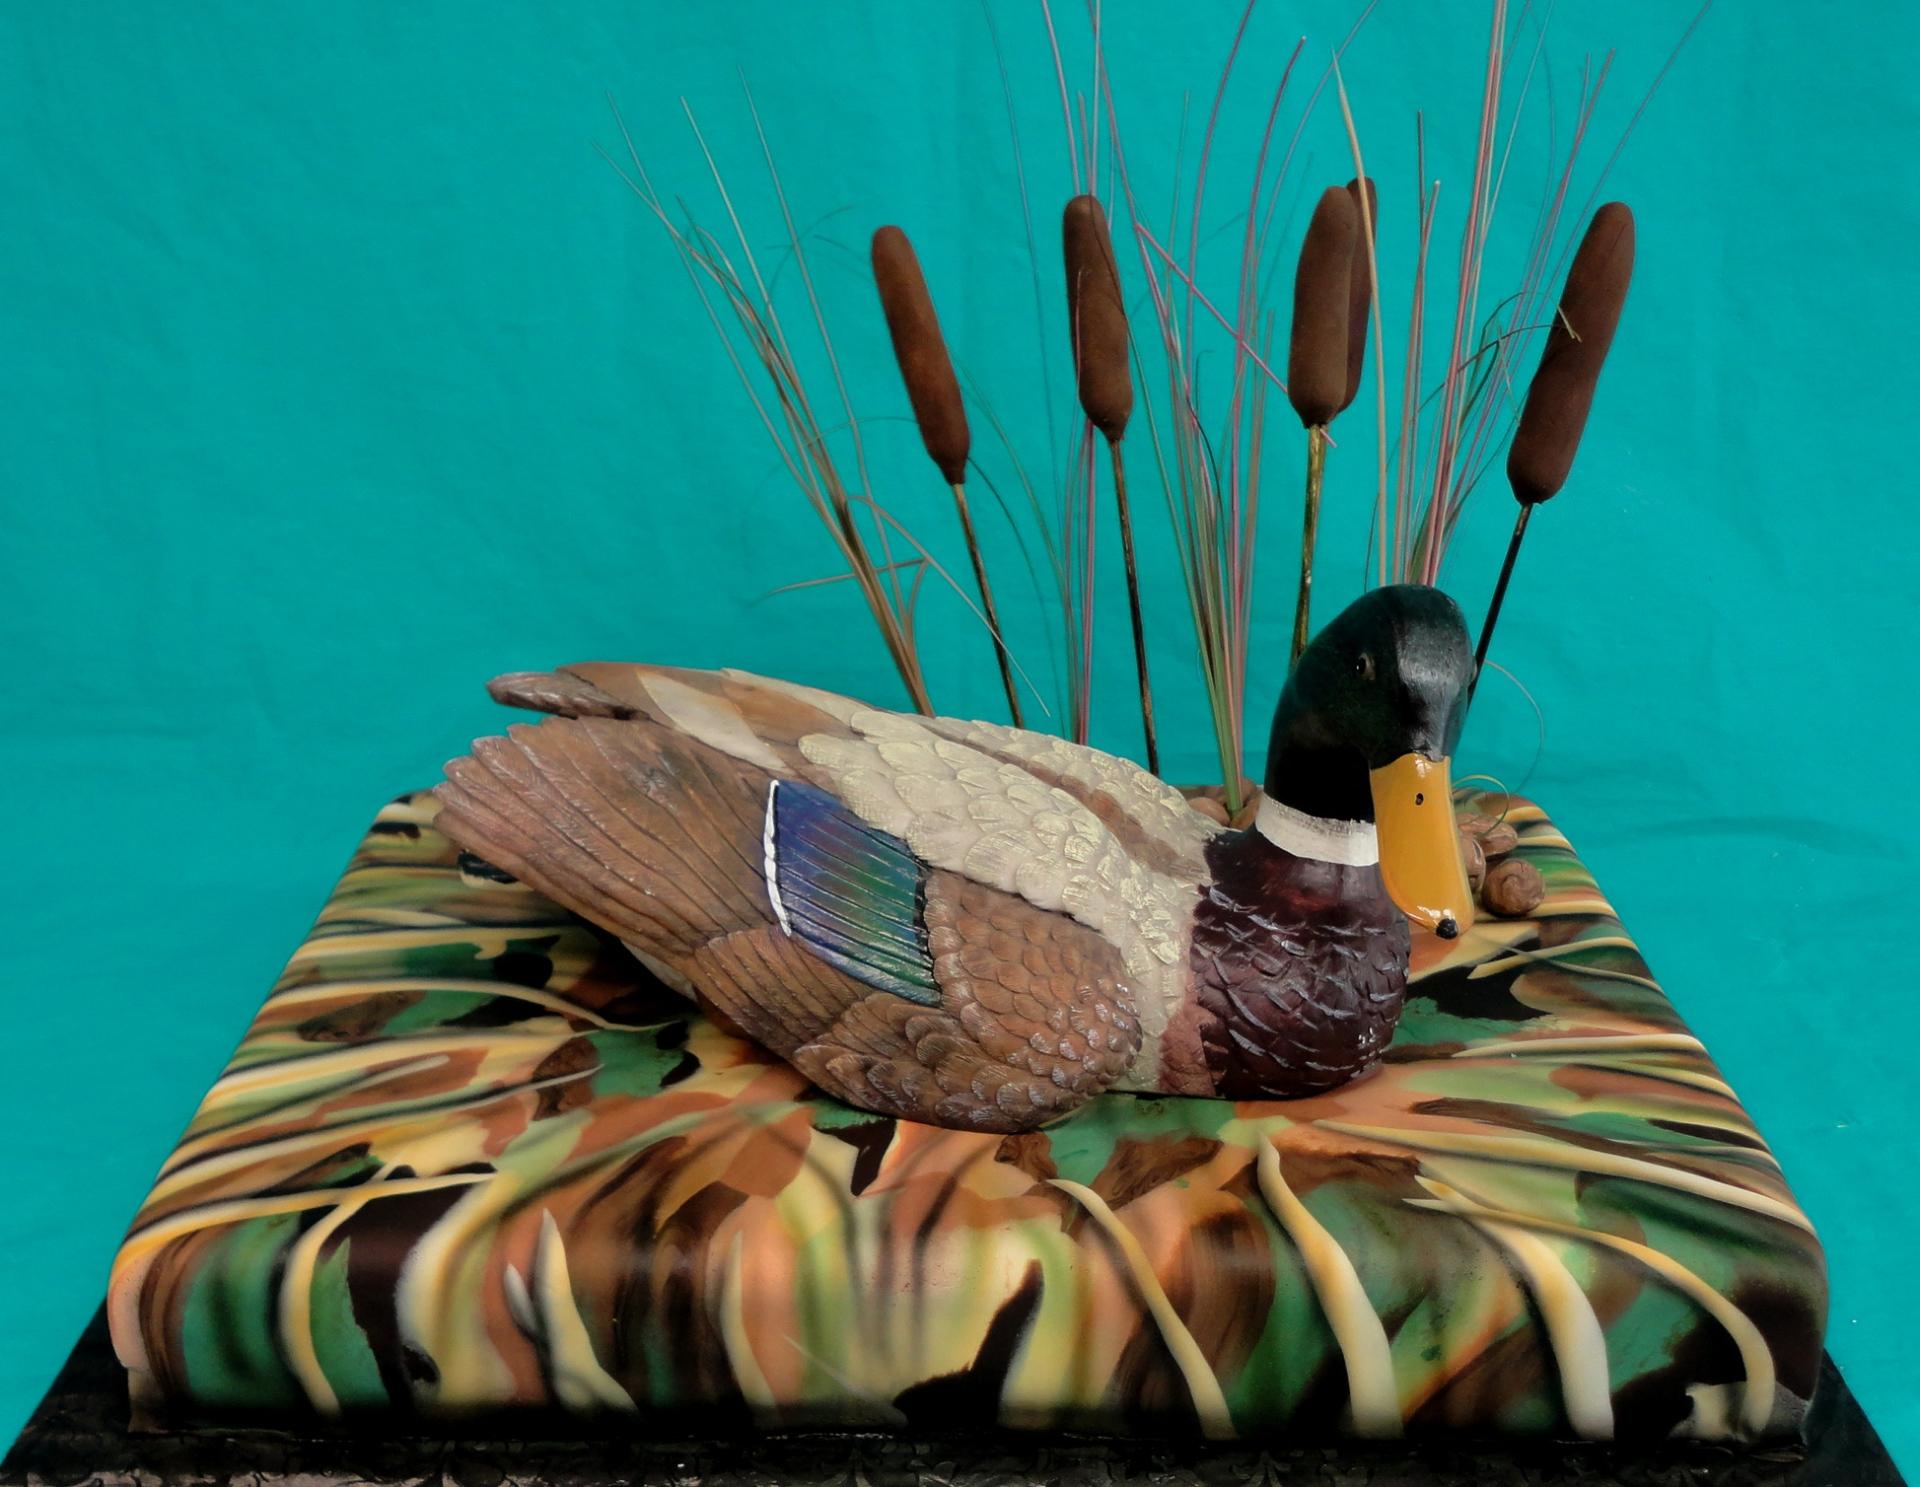 duck cake, shadow grass